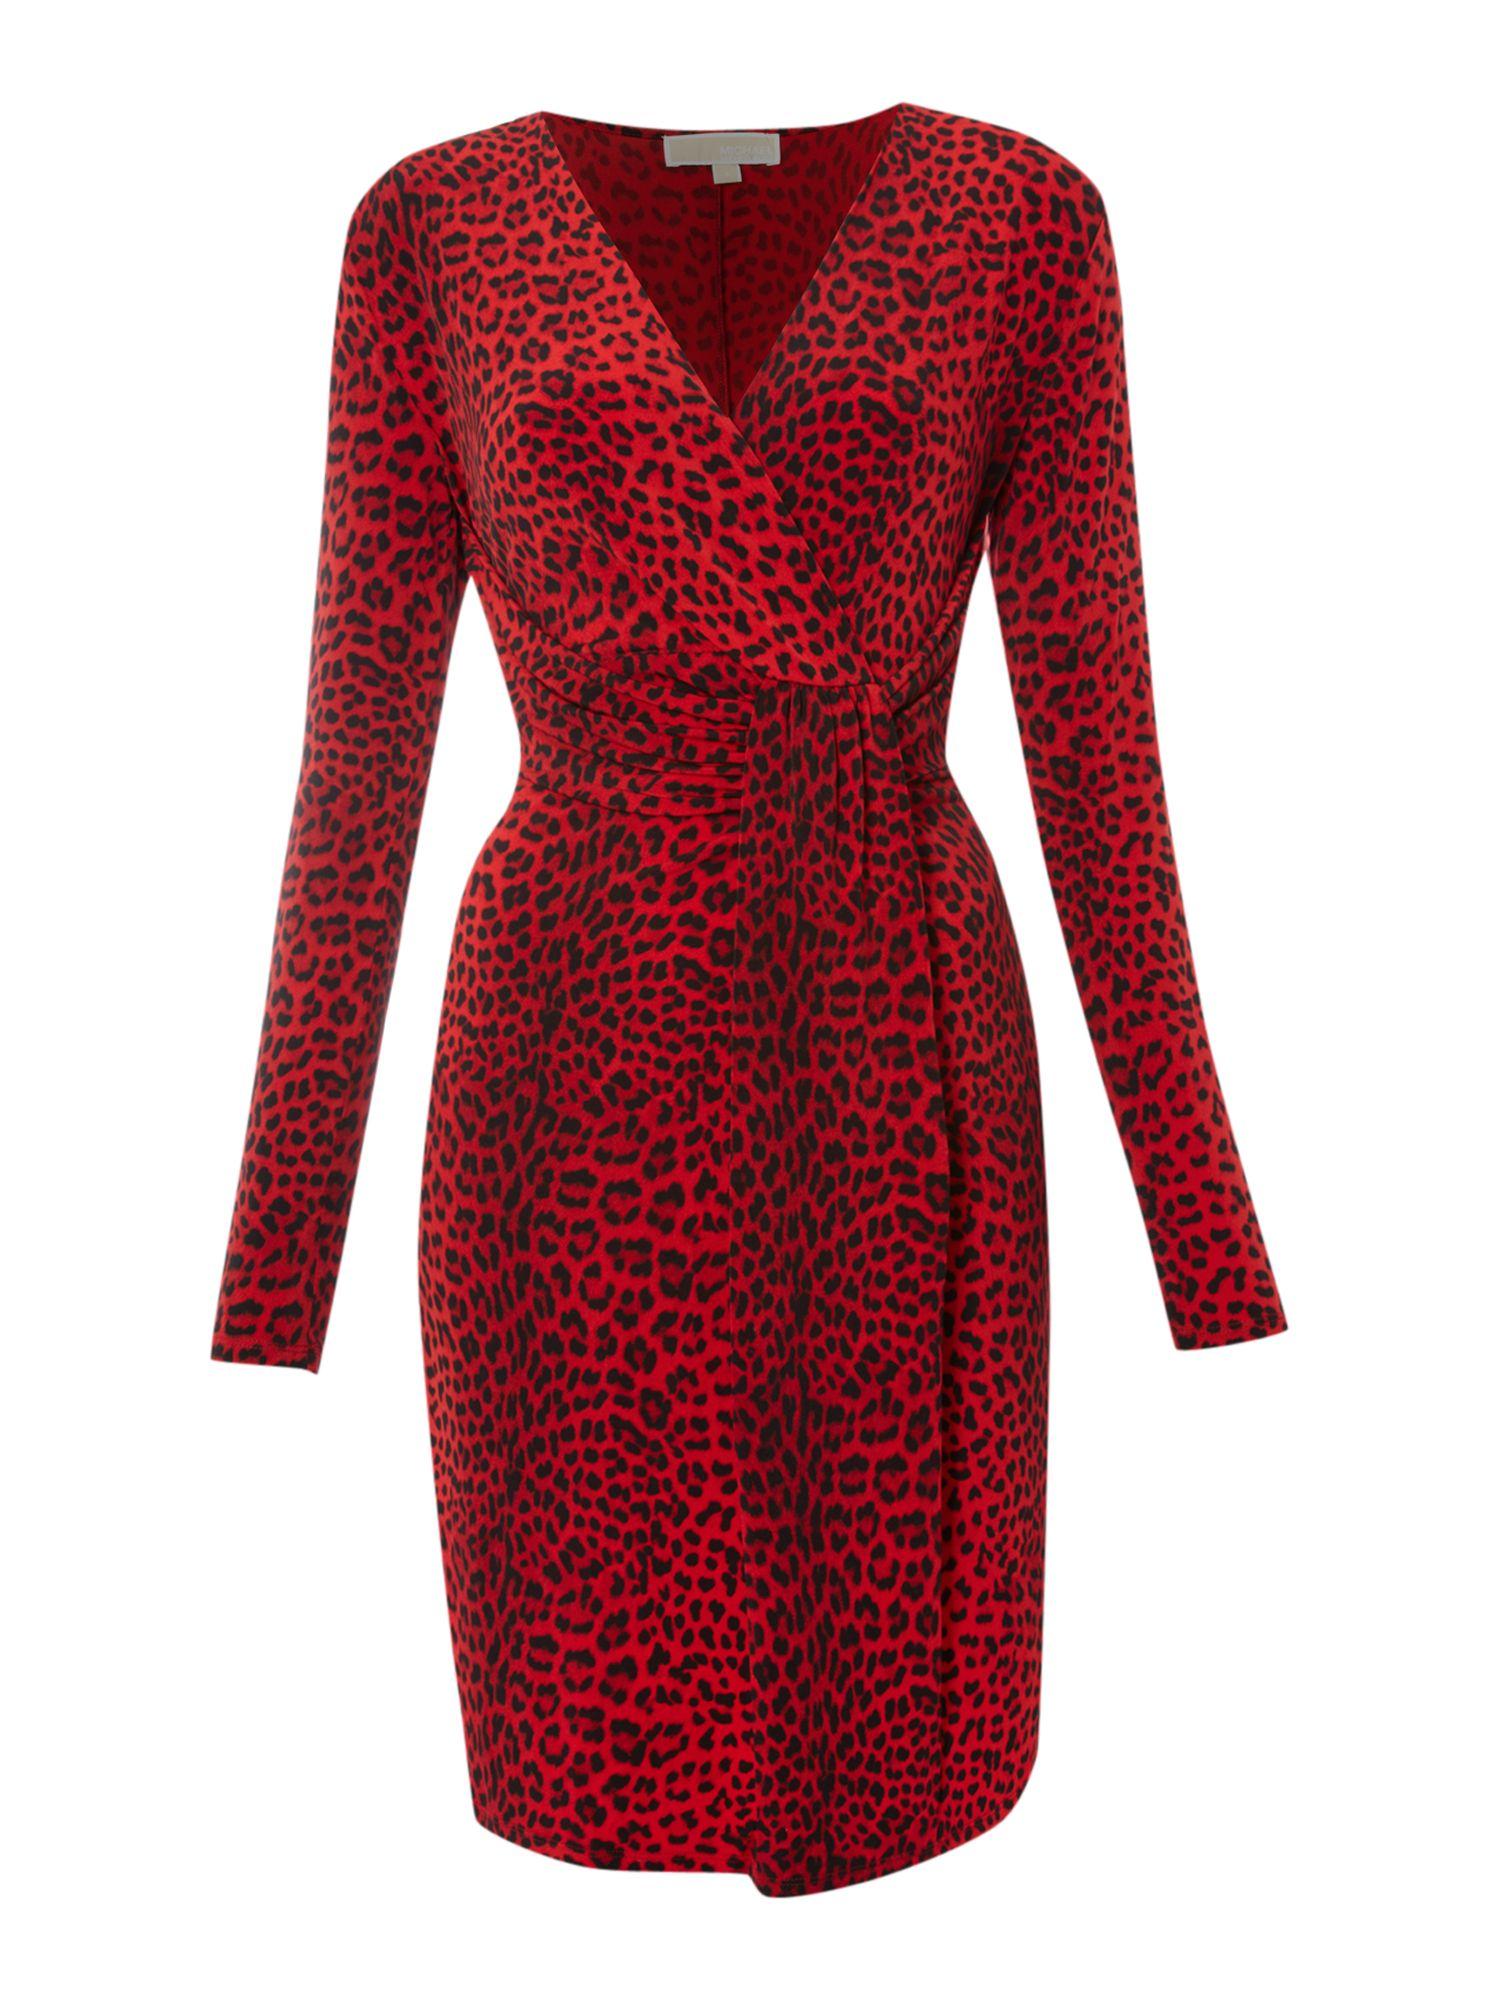 Michael michael kors Leopard Print Jersey Dress in Red | Lyst